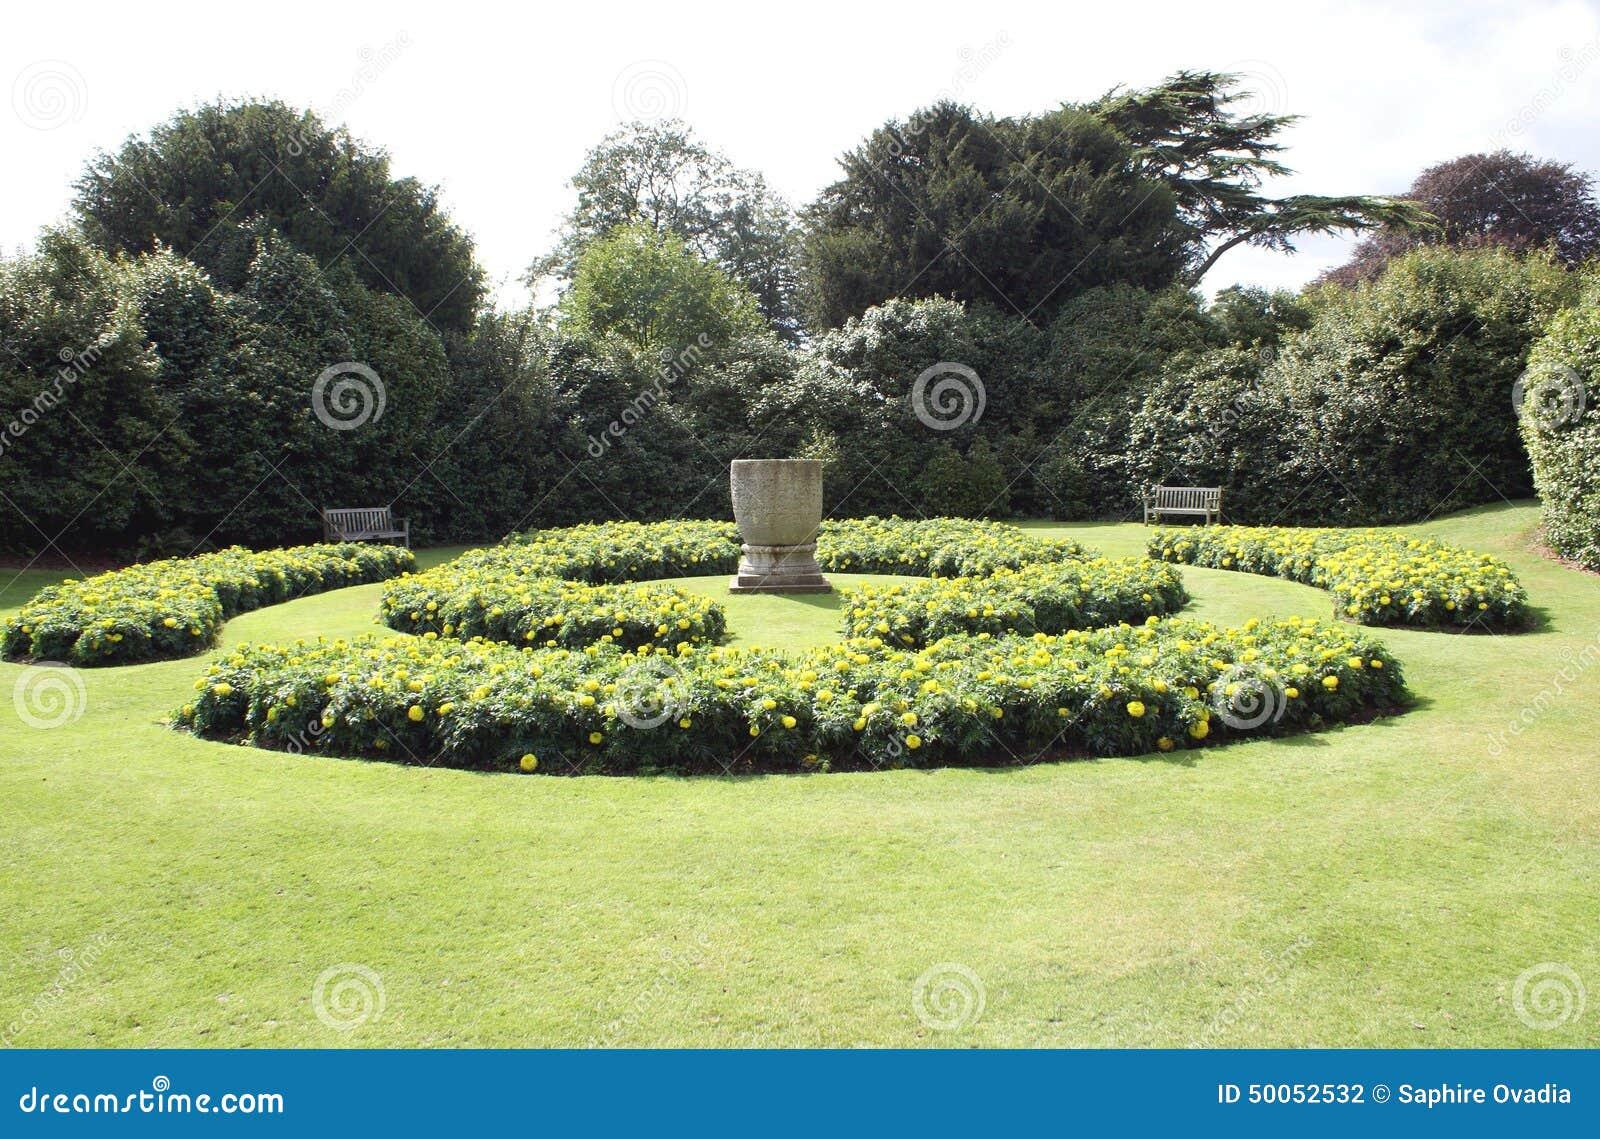 Download Sunken Garden. Flower Beds. Urn. Garden Scene Stock Photo   Image  Of